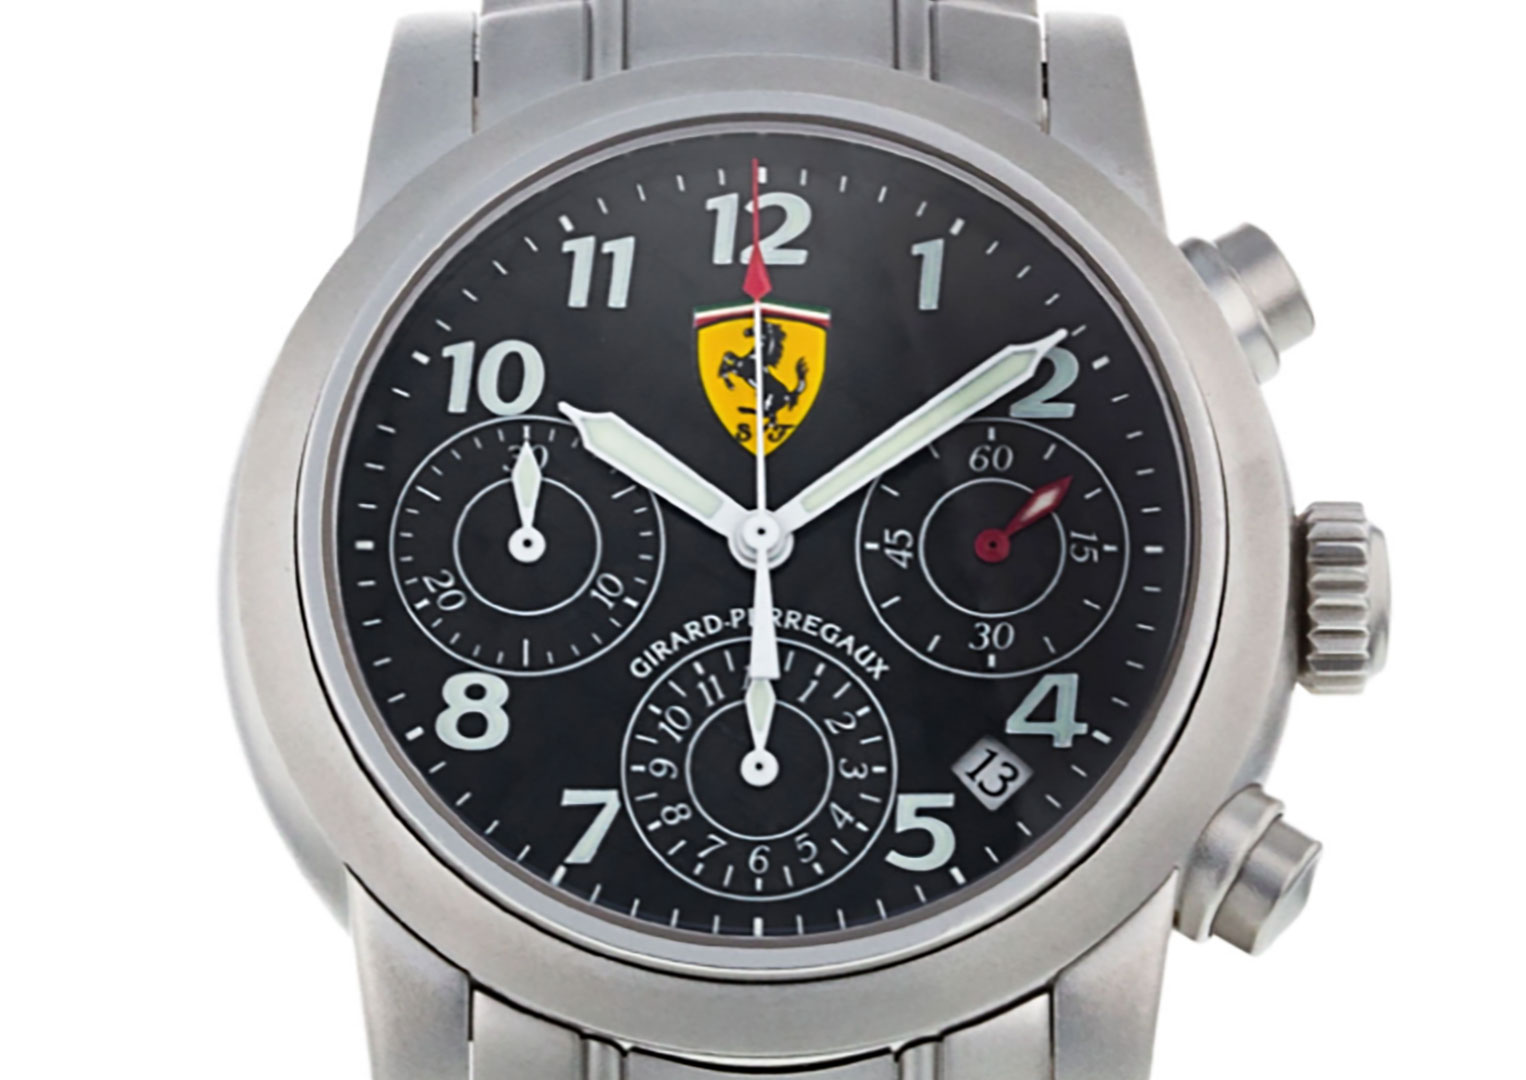 A Girard-Perregaux Ferrari chronograph